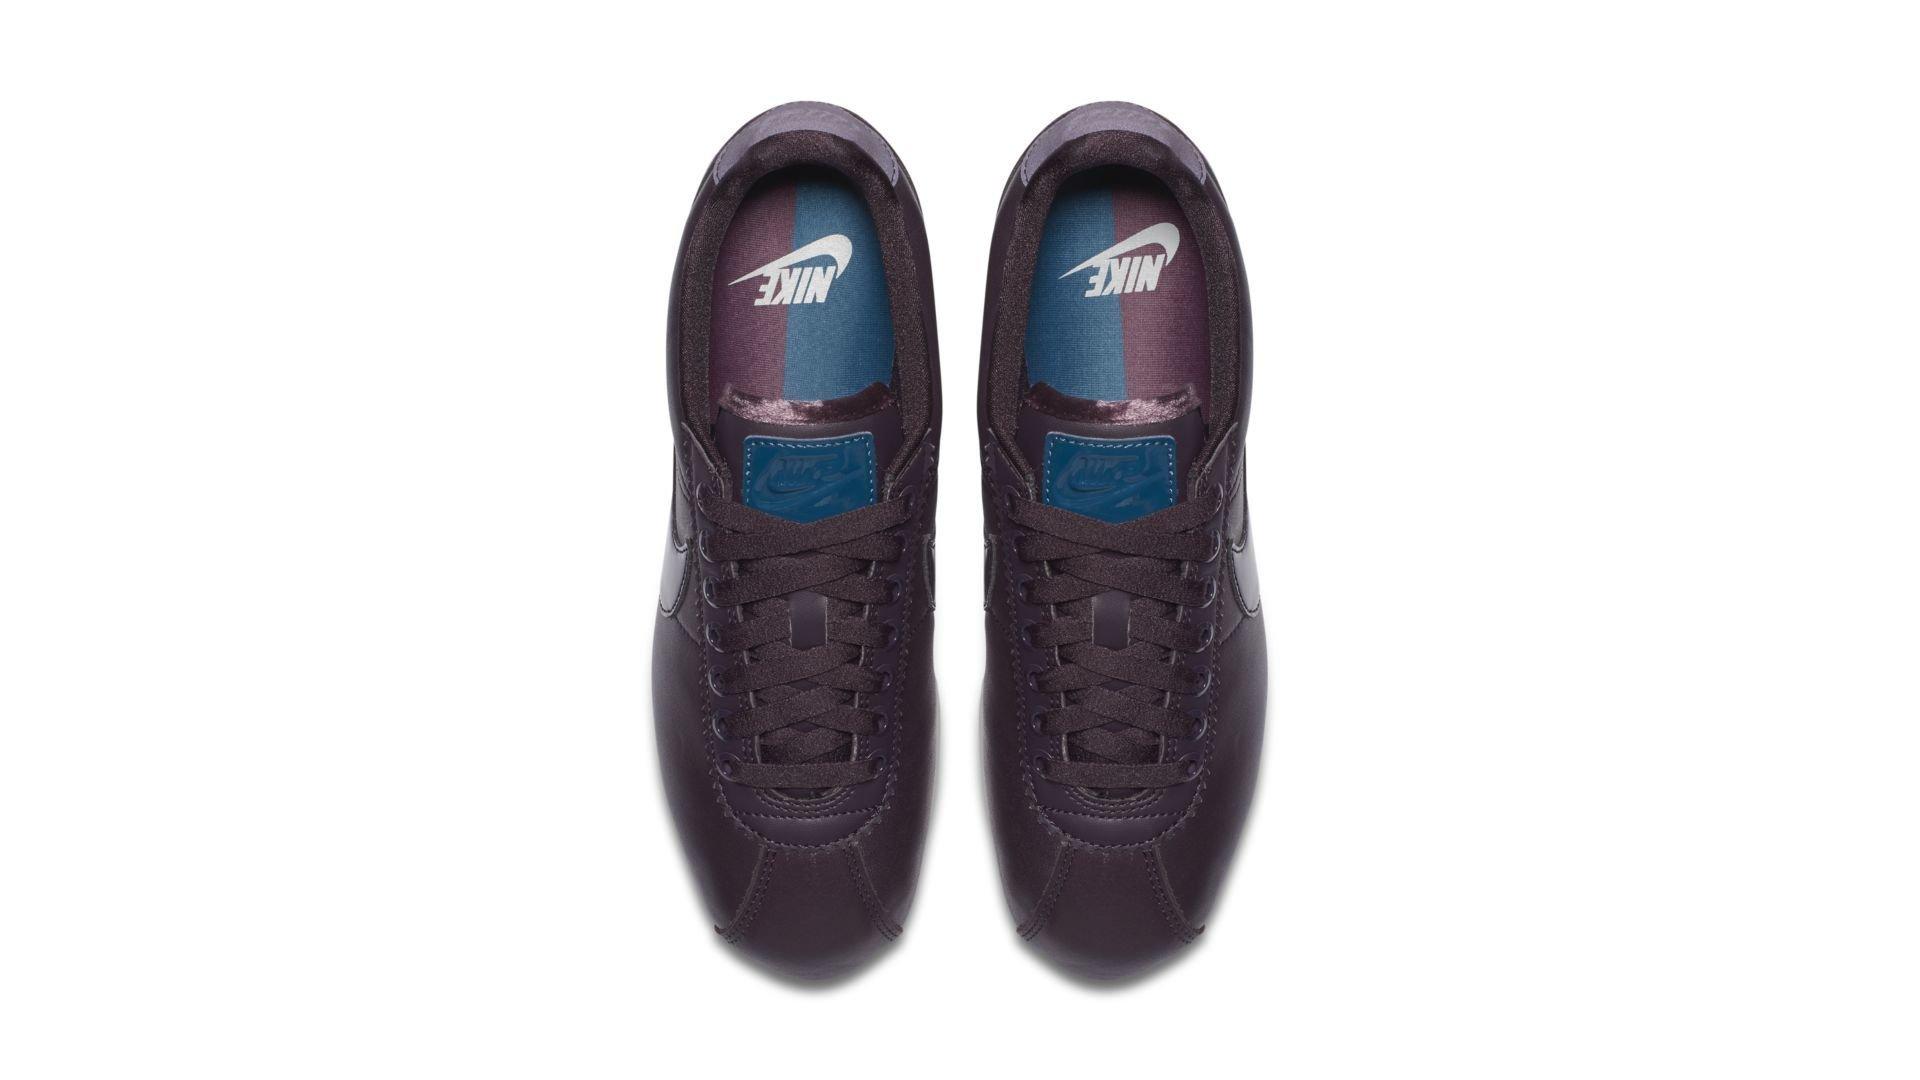 Nike Classic Cortez Nocturne Port Wine (W) (AJ0135-600)